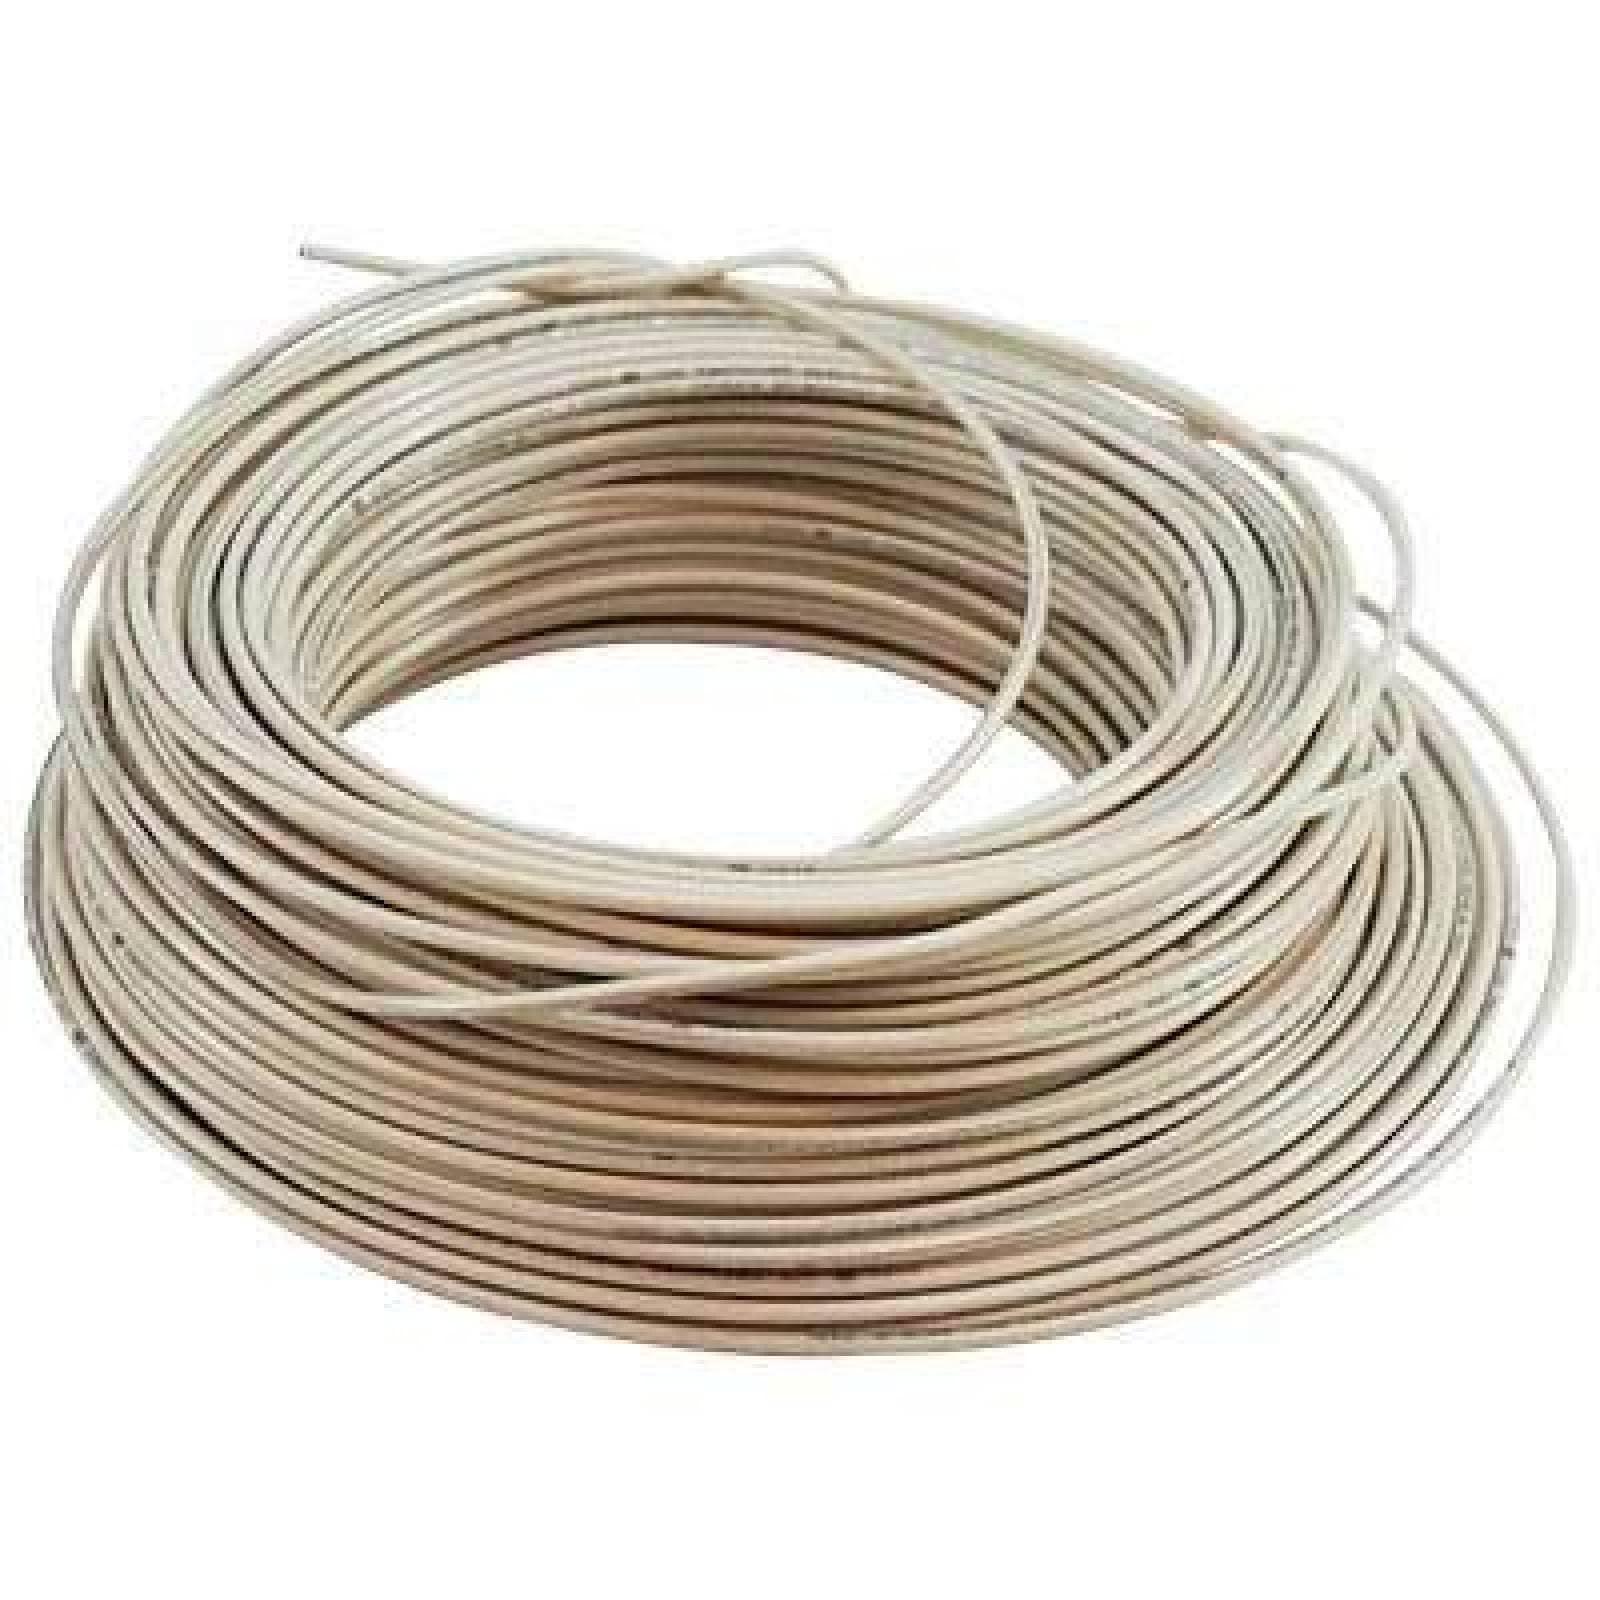 Cable Electrico Iusa Blanco Thwc 10 5033